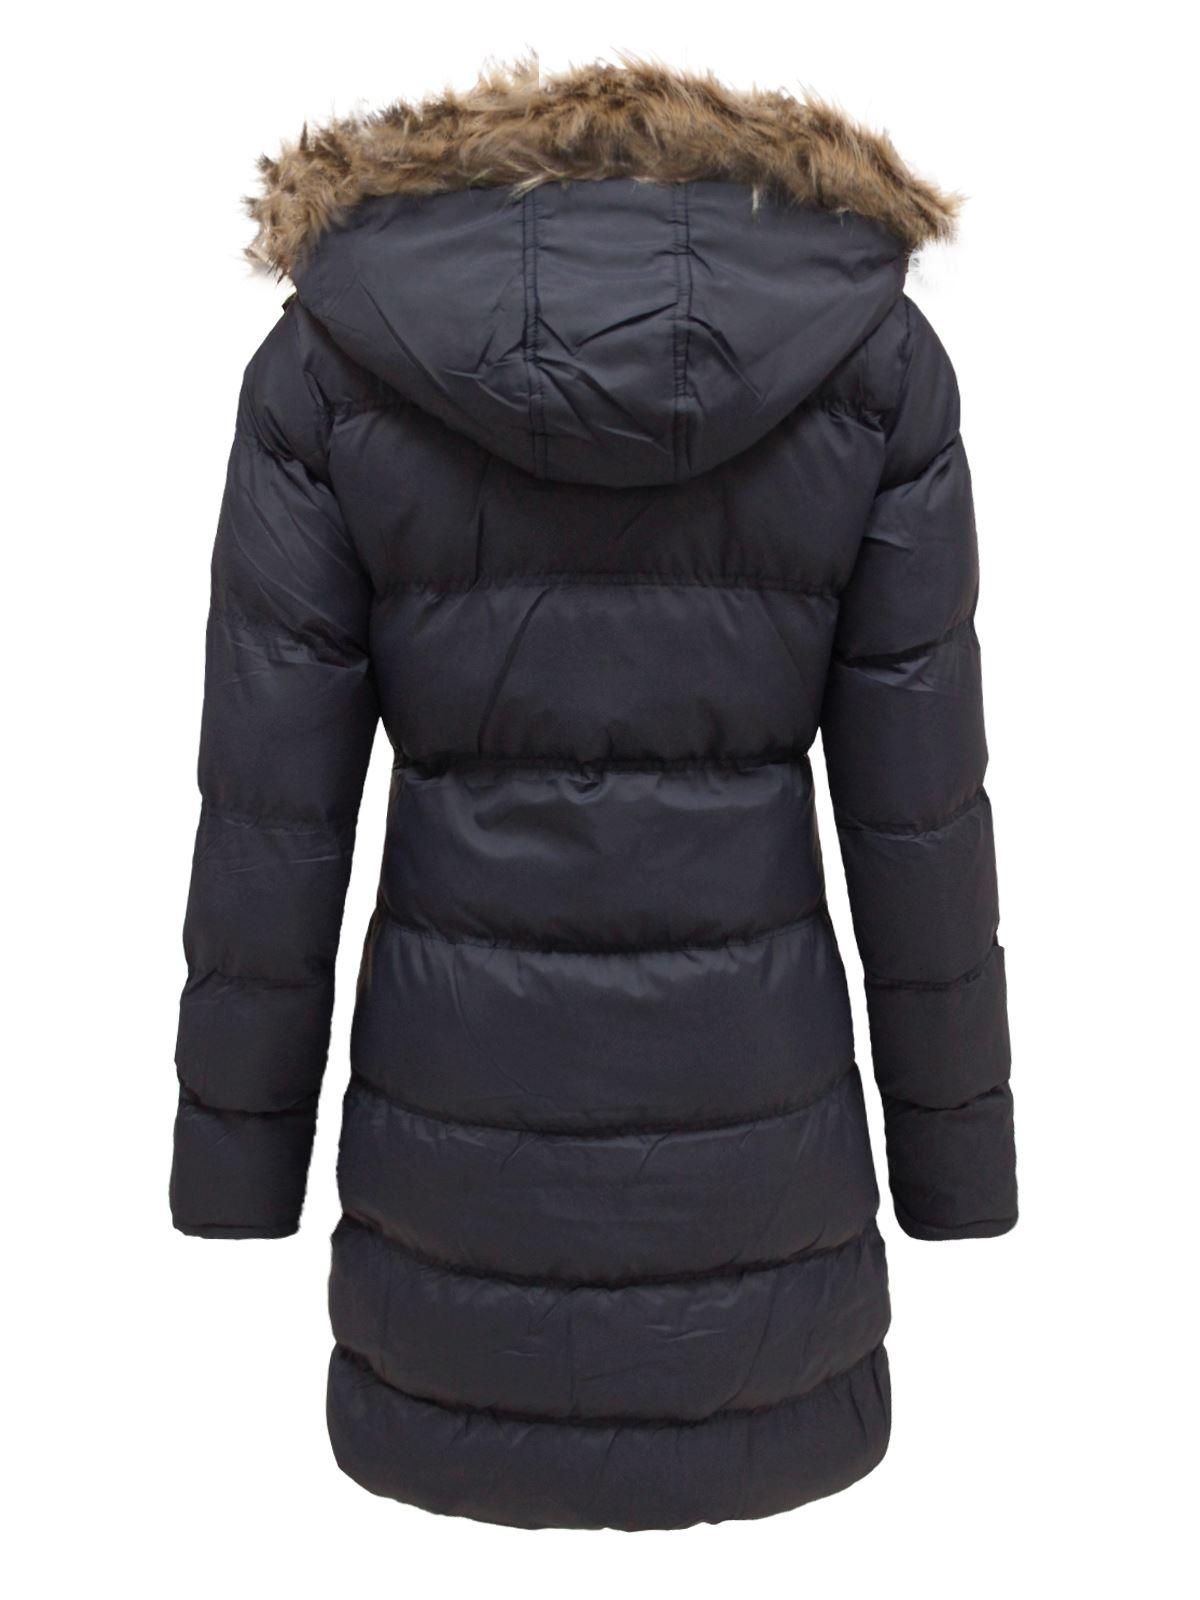 c4473567994 Sentinel Ladies Brave Soul Hop Long Hooded Padded Puffer Parka Winter  Jacket Coat